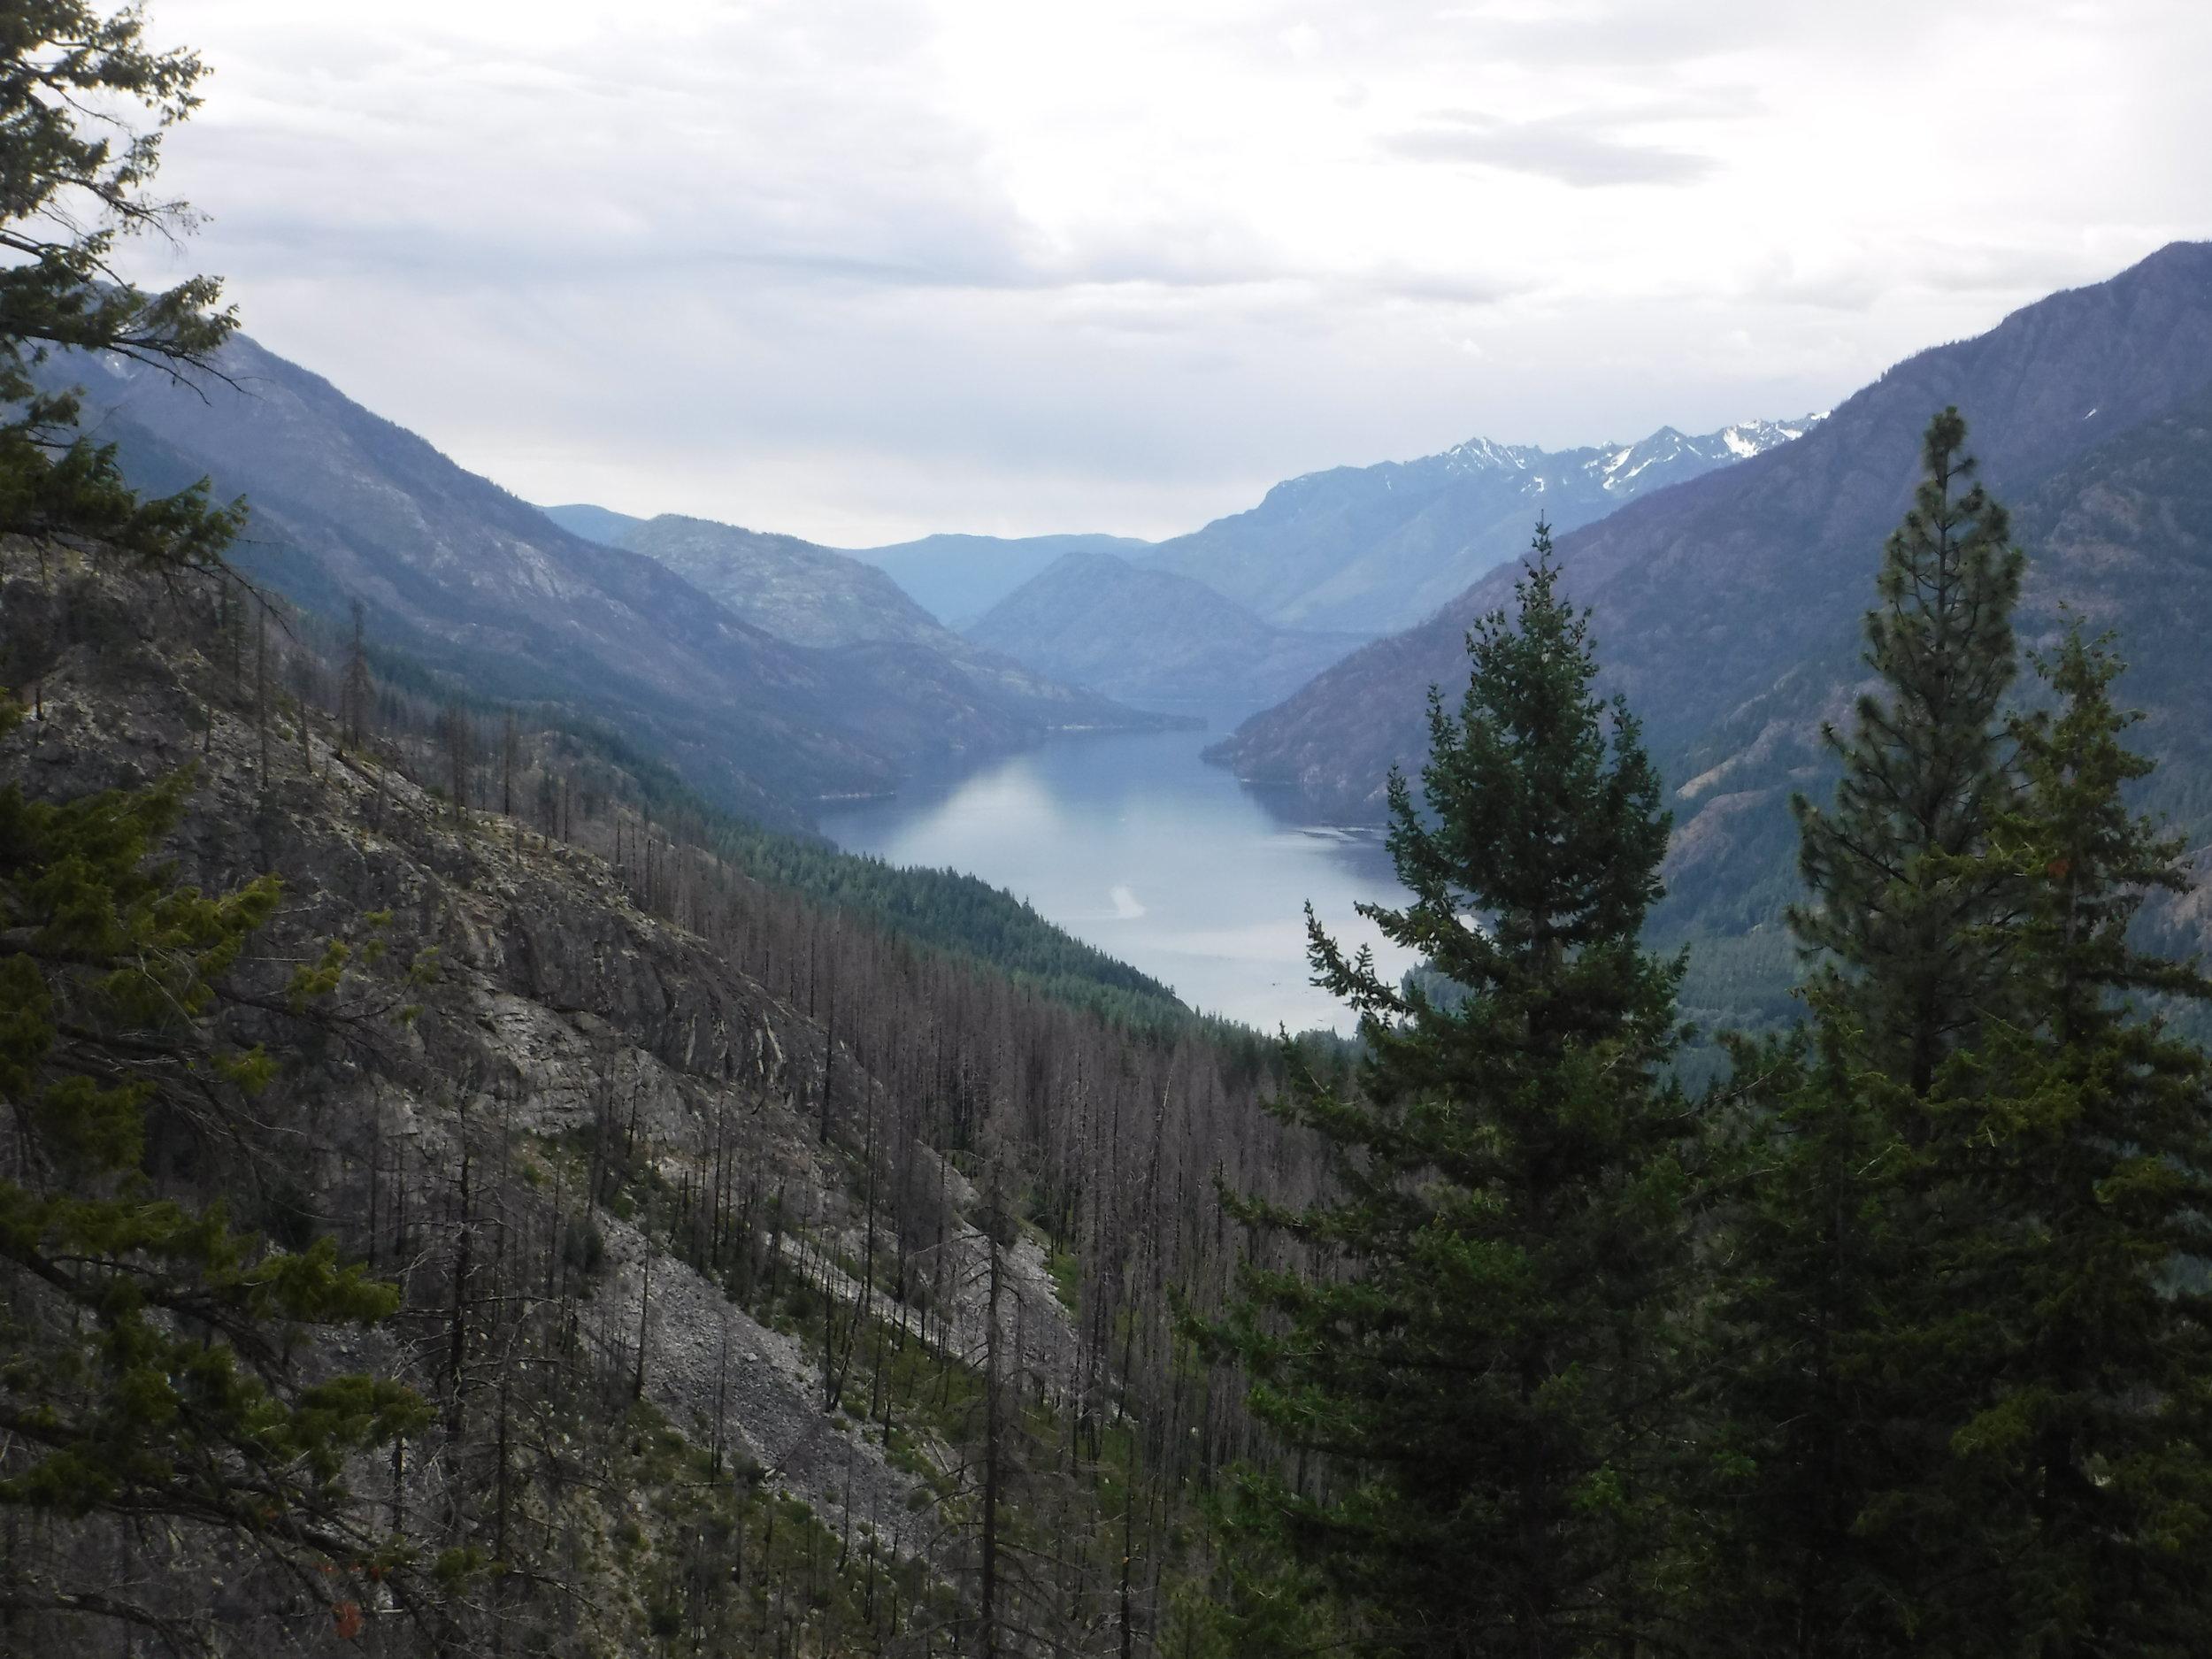 Northern end of Lake Chelan. Taken from Rainbow Loop Trail.